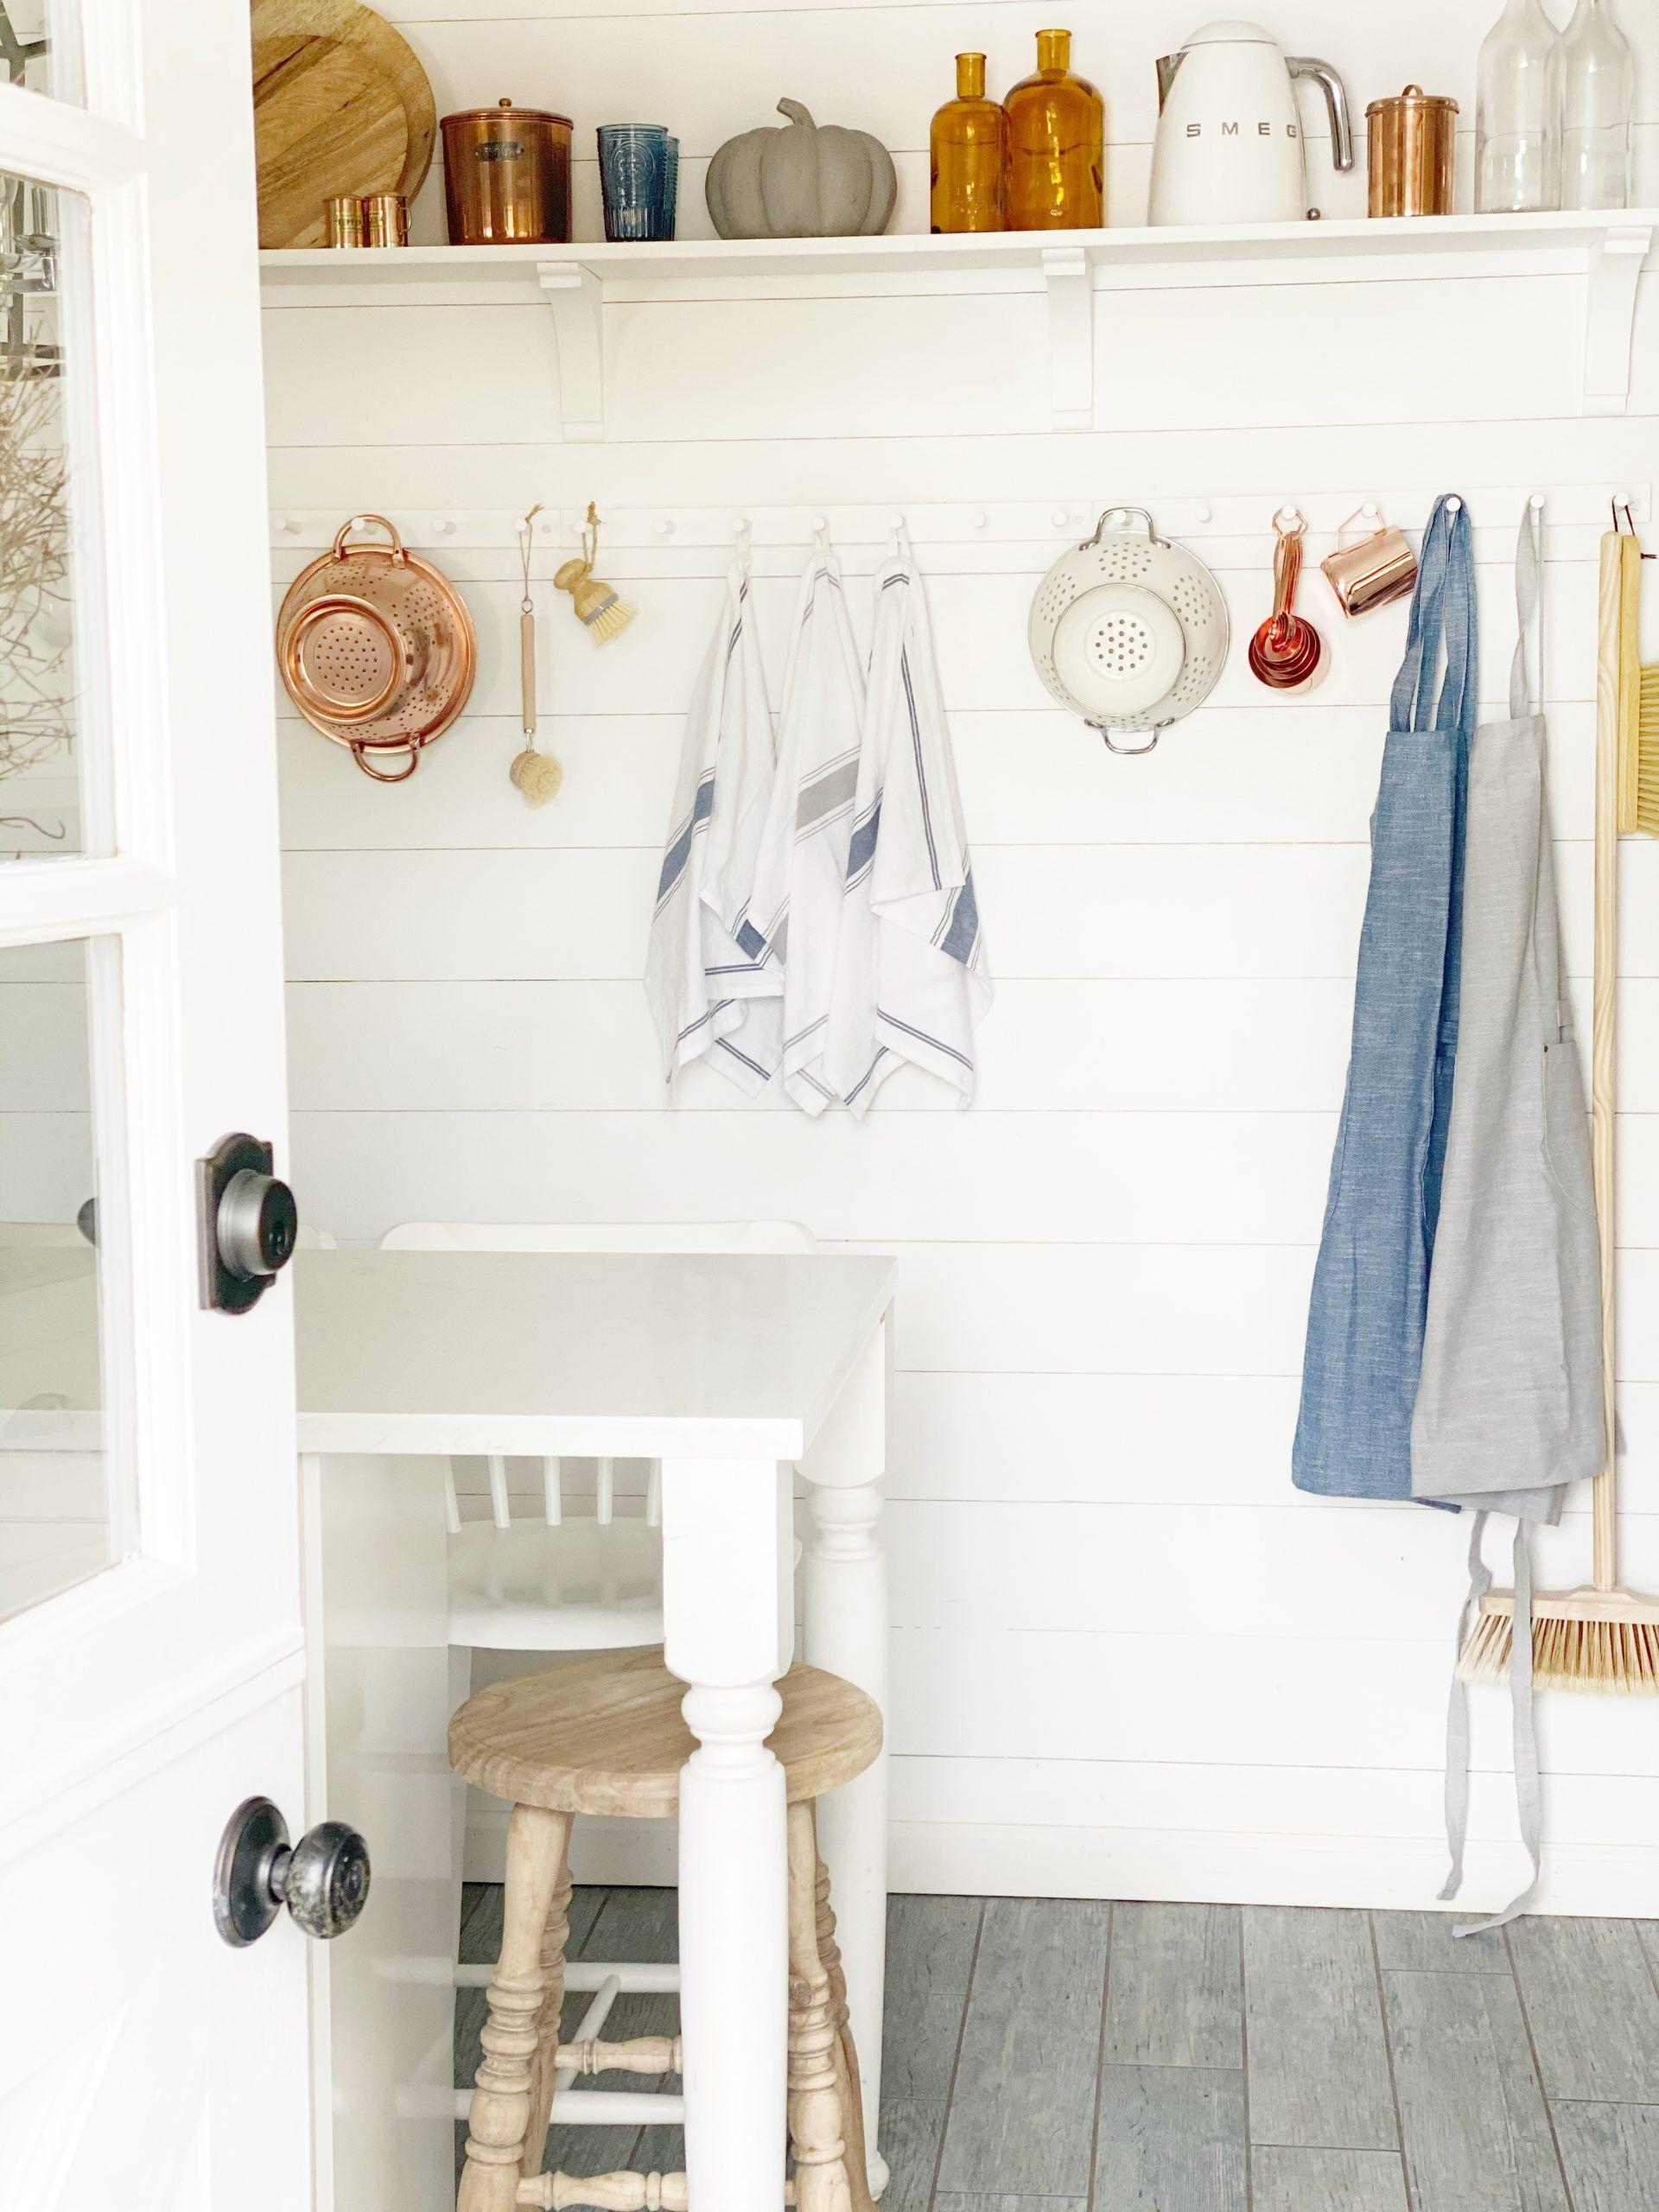 Fall Decor Ideas Bed Bath Beyond Bed Bath And Beyond Fall Decor Kitchen Decor Inspiration